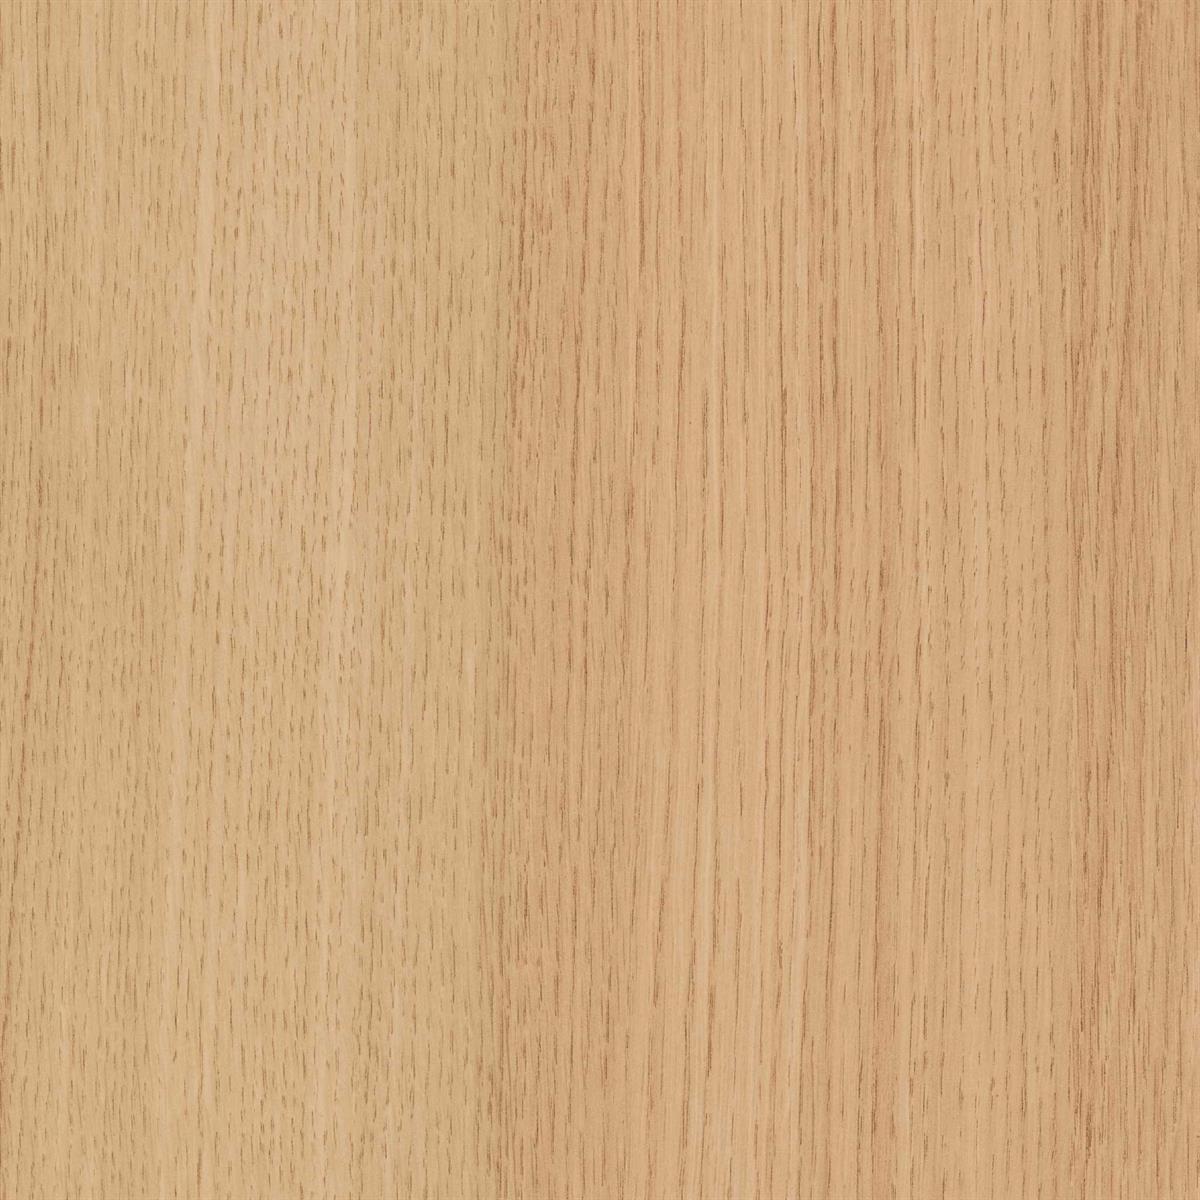 Light Ferrara Oak A Unique Choice